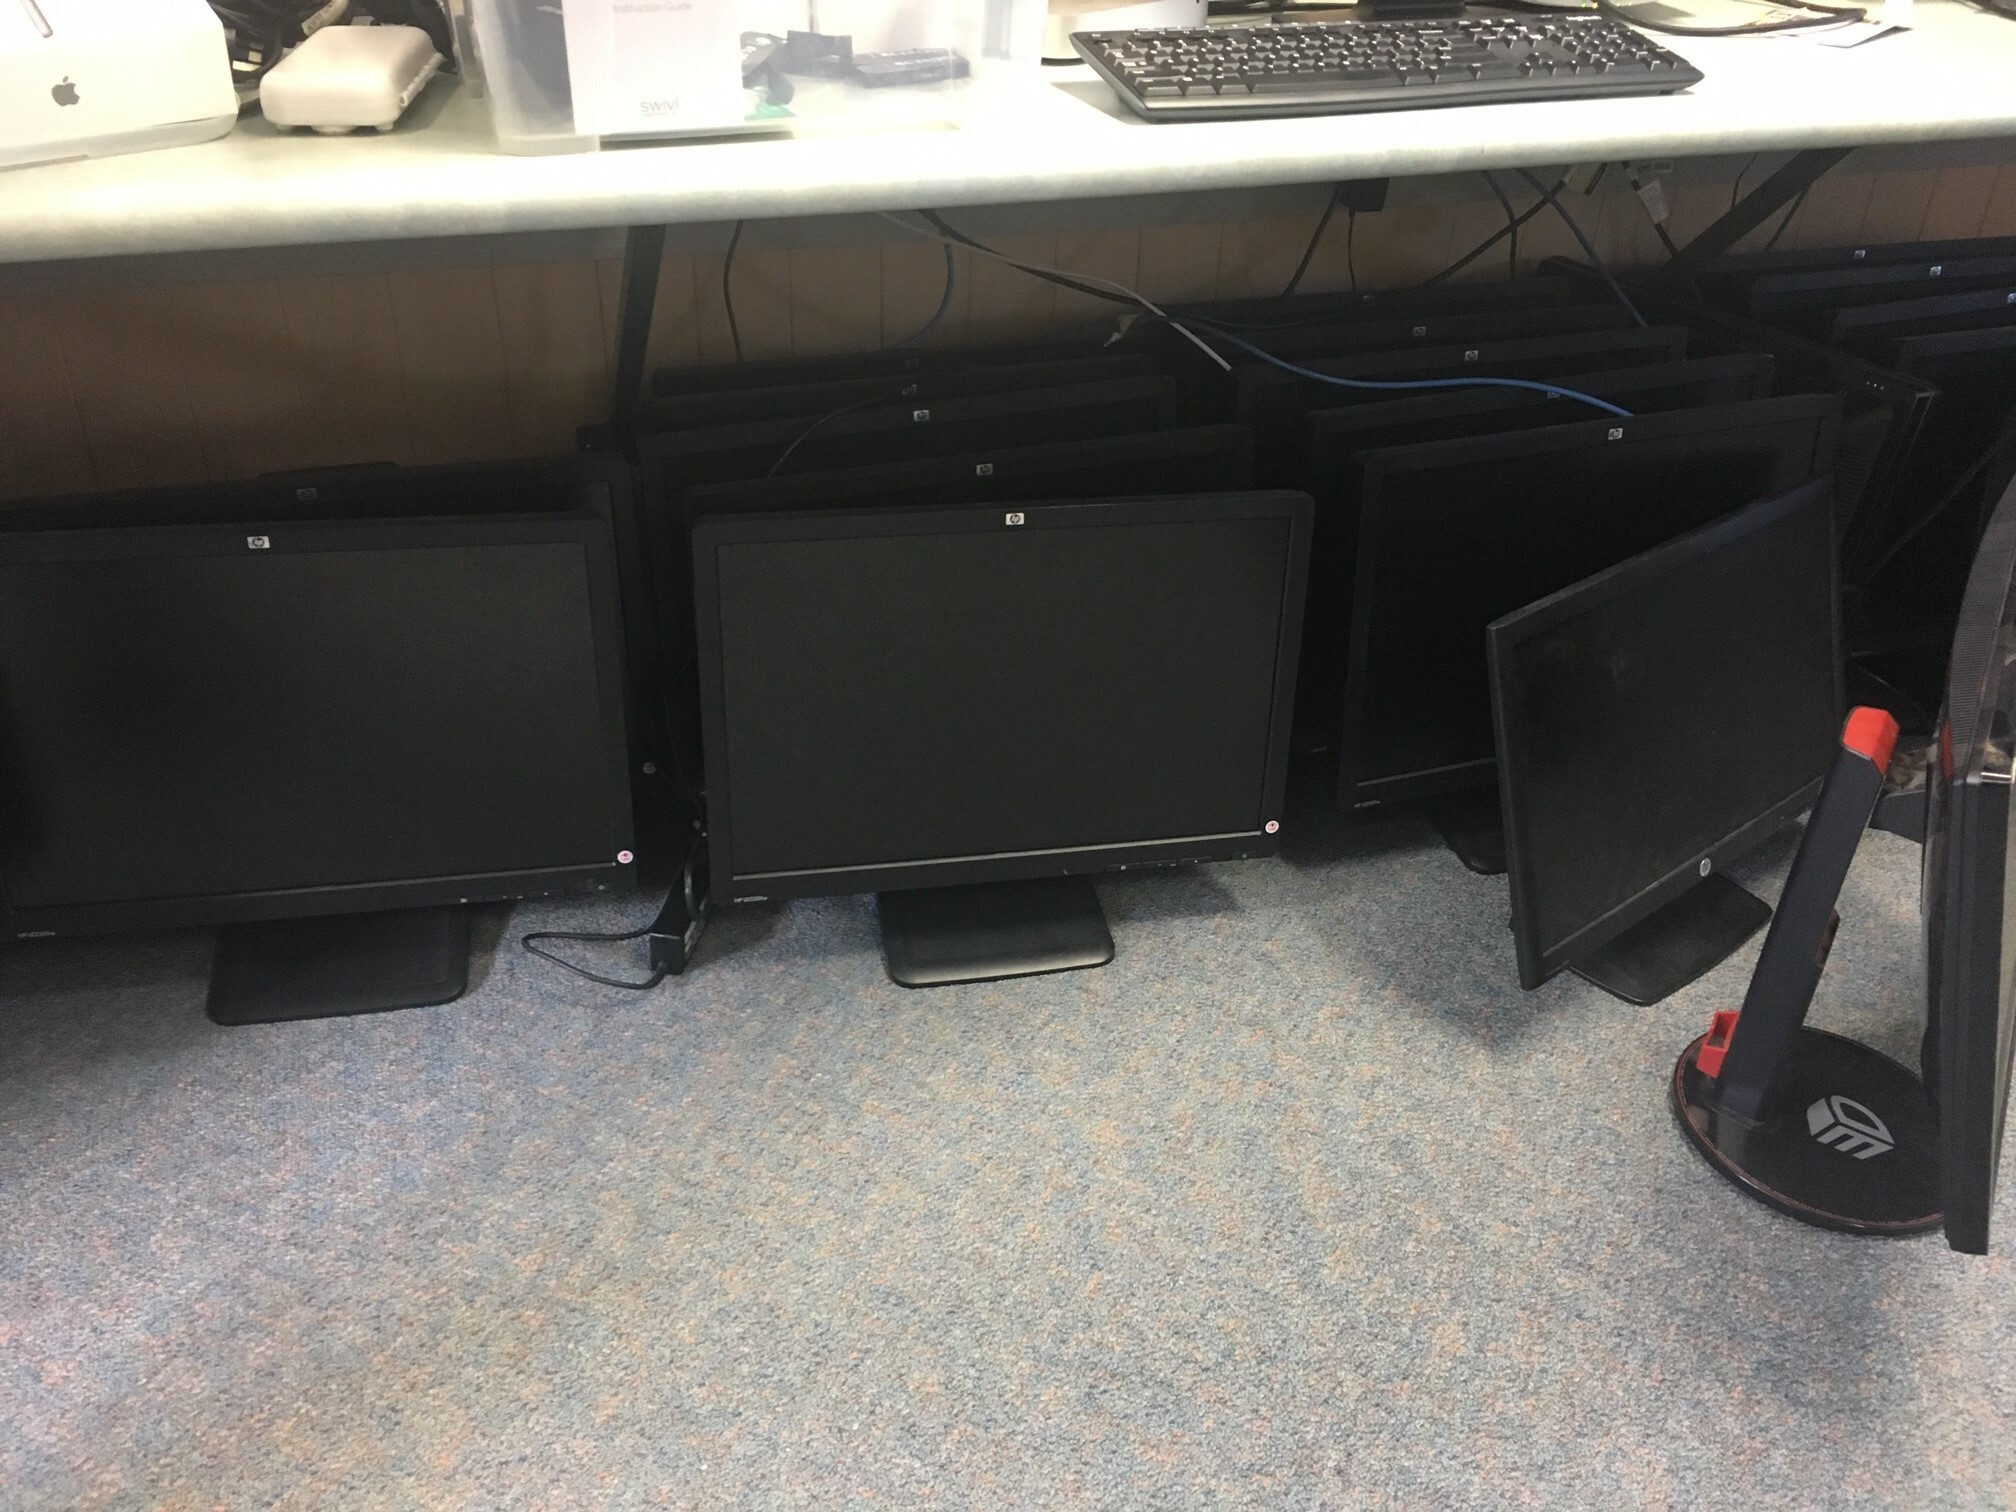 Computers 4